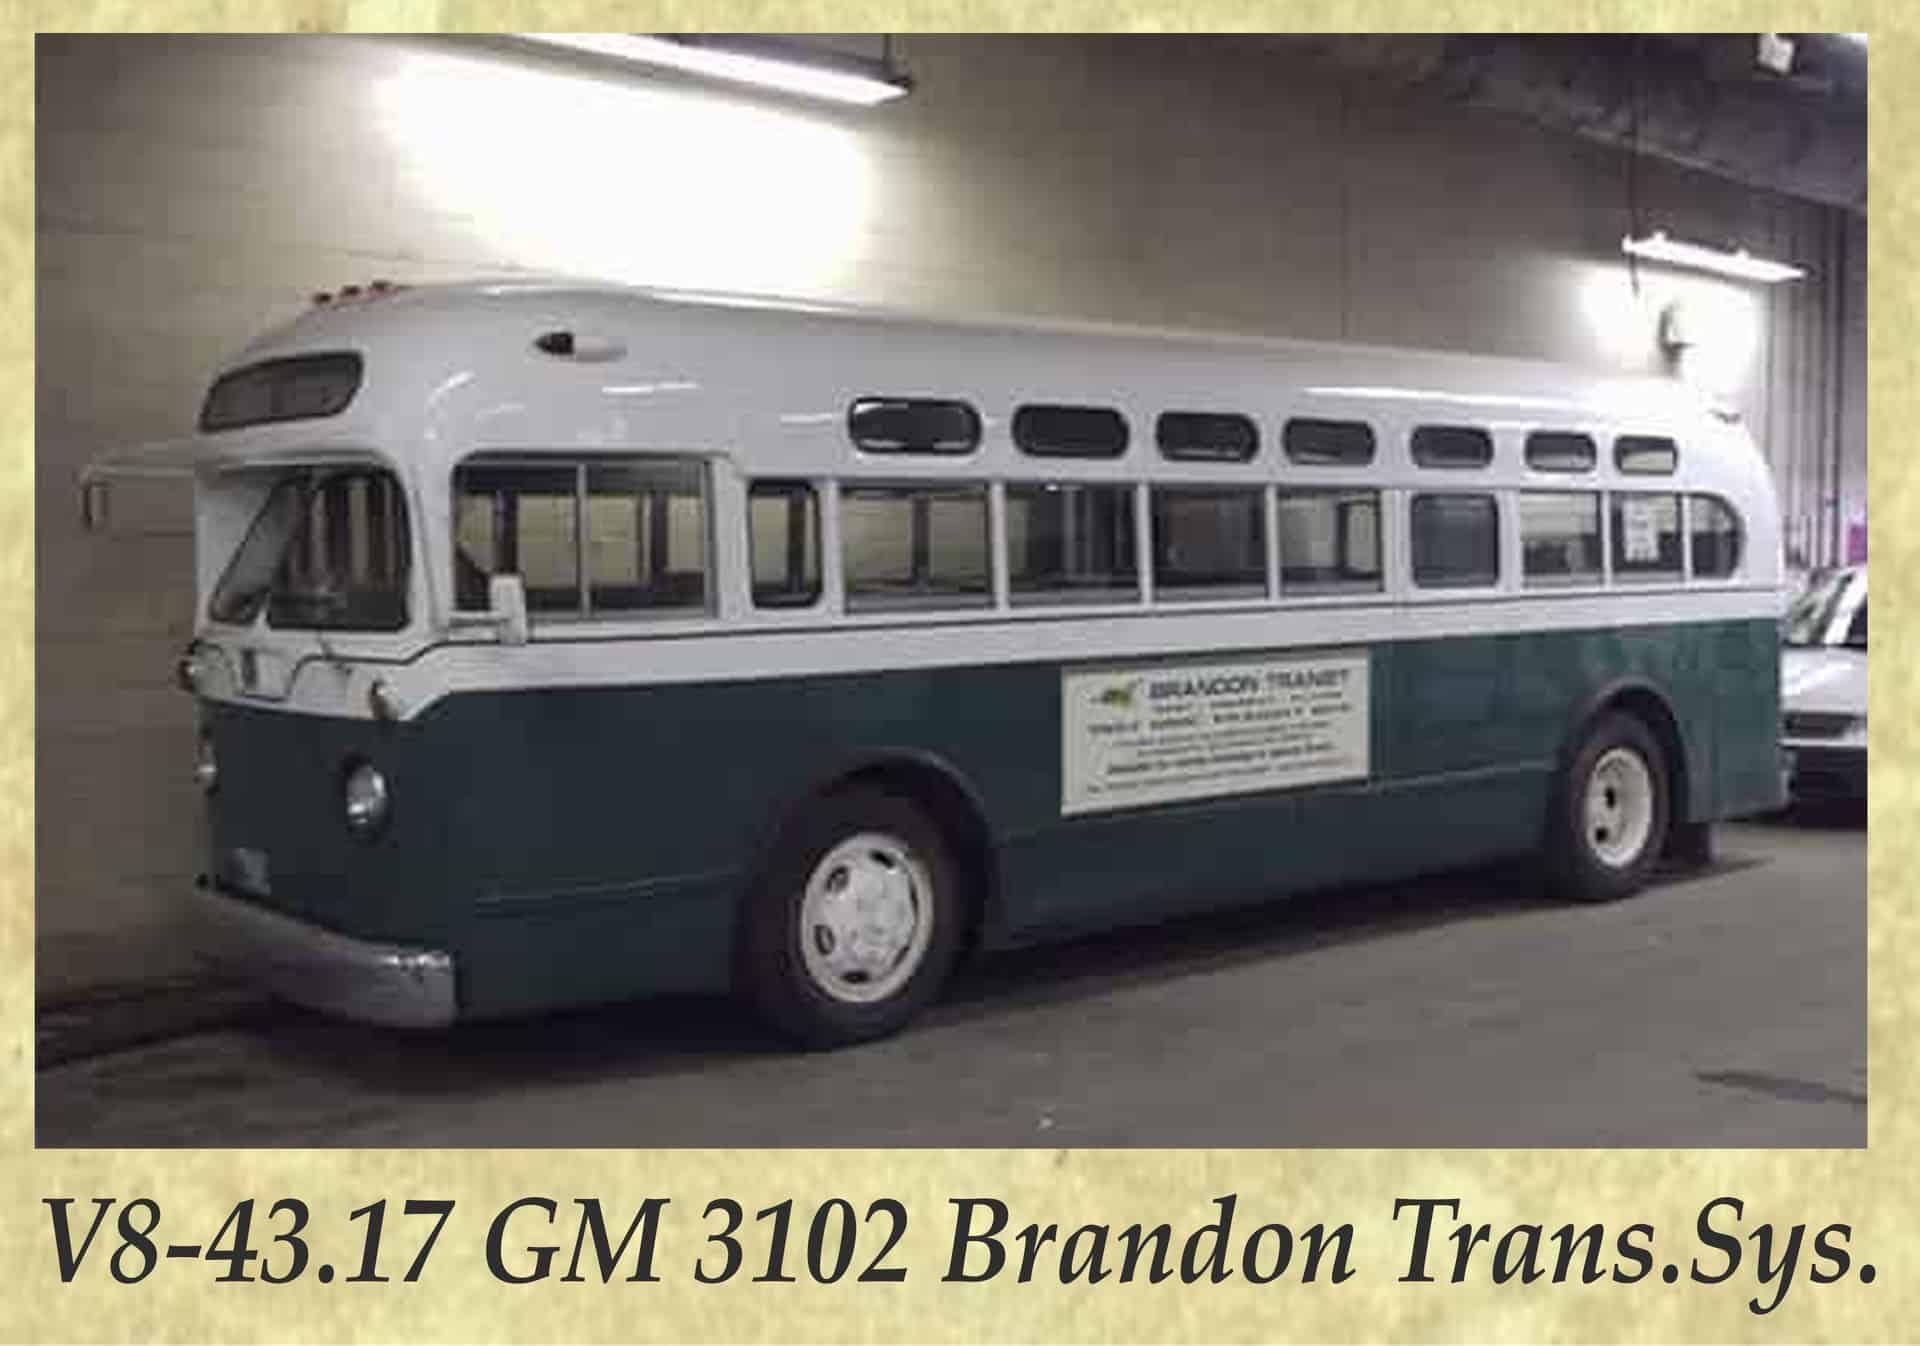 V8-43.17 GM 3102 Brandon Trans.Sys.